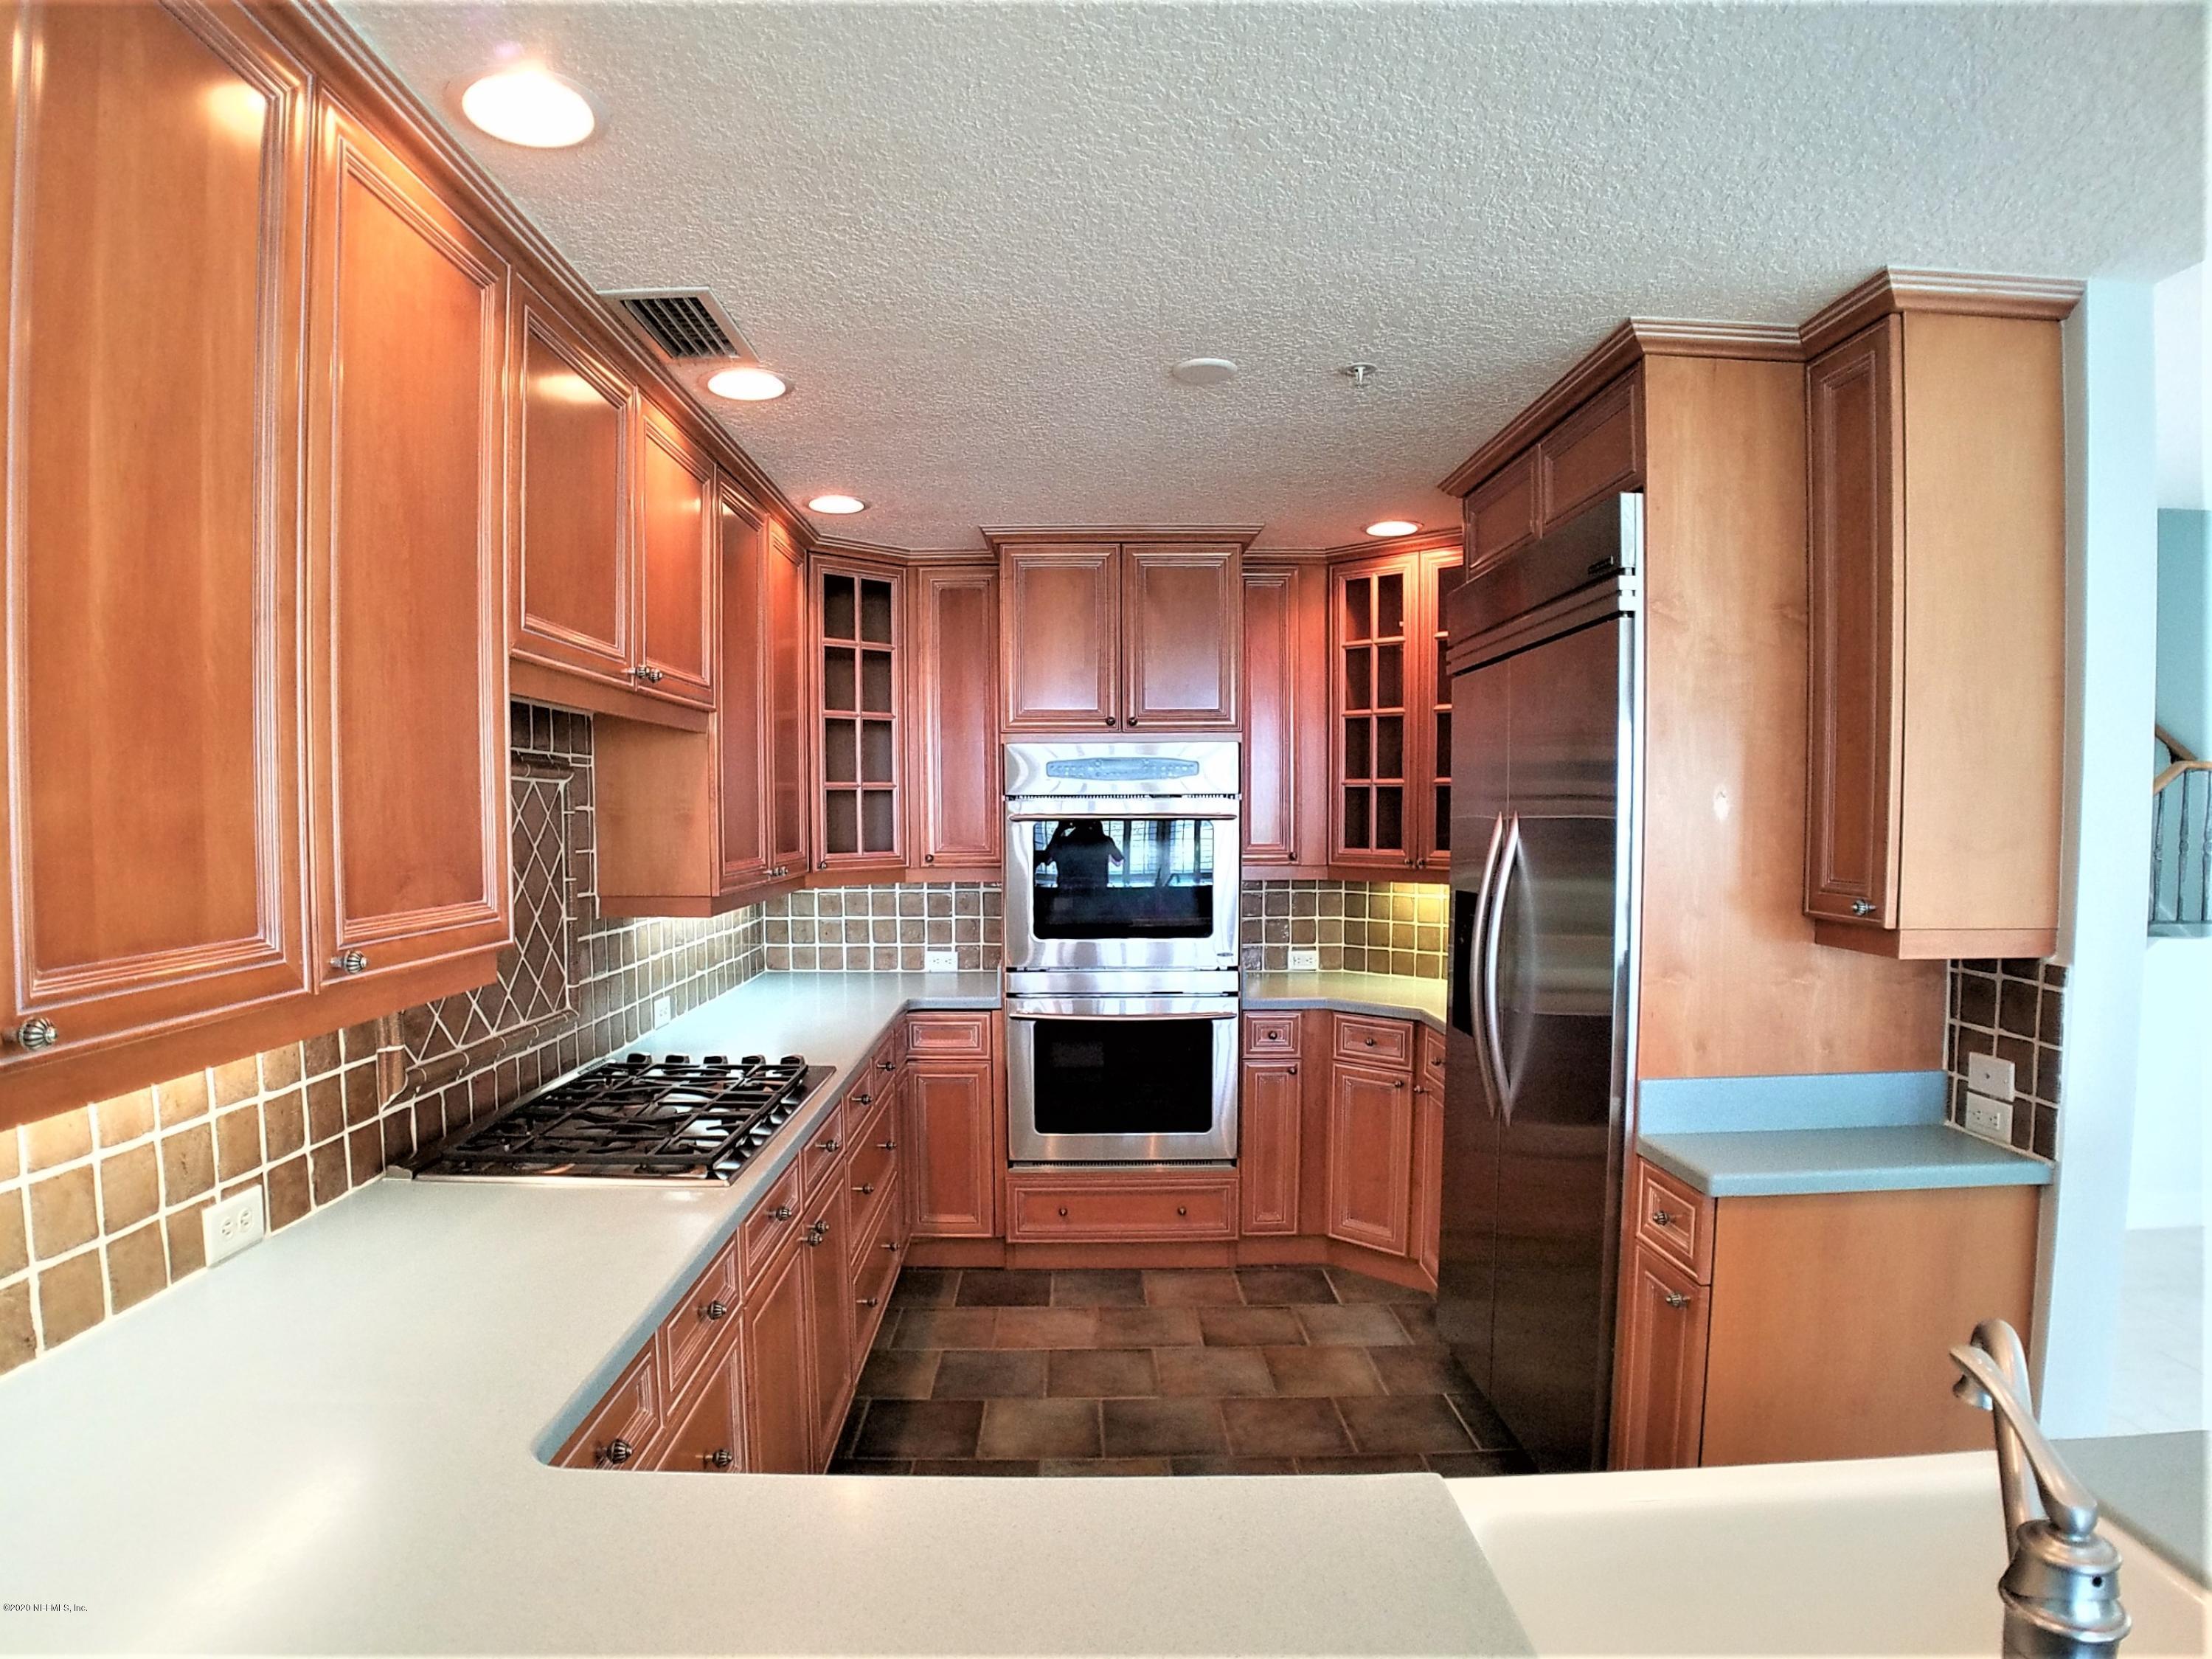 2103 WINDJAMMER, ST AUGUSTINE, FLORIDA 32084, 4 Bedrooms Bedrooms, ,4 BathroomsBathrooms,Residential,For sale,WINDJAMMER,1080296